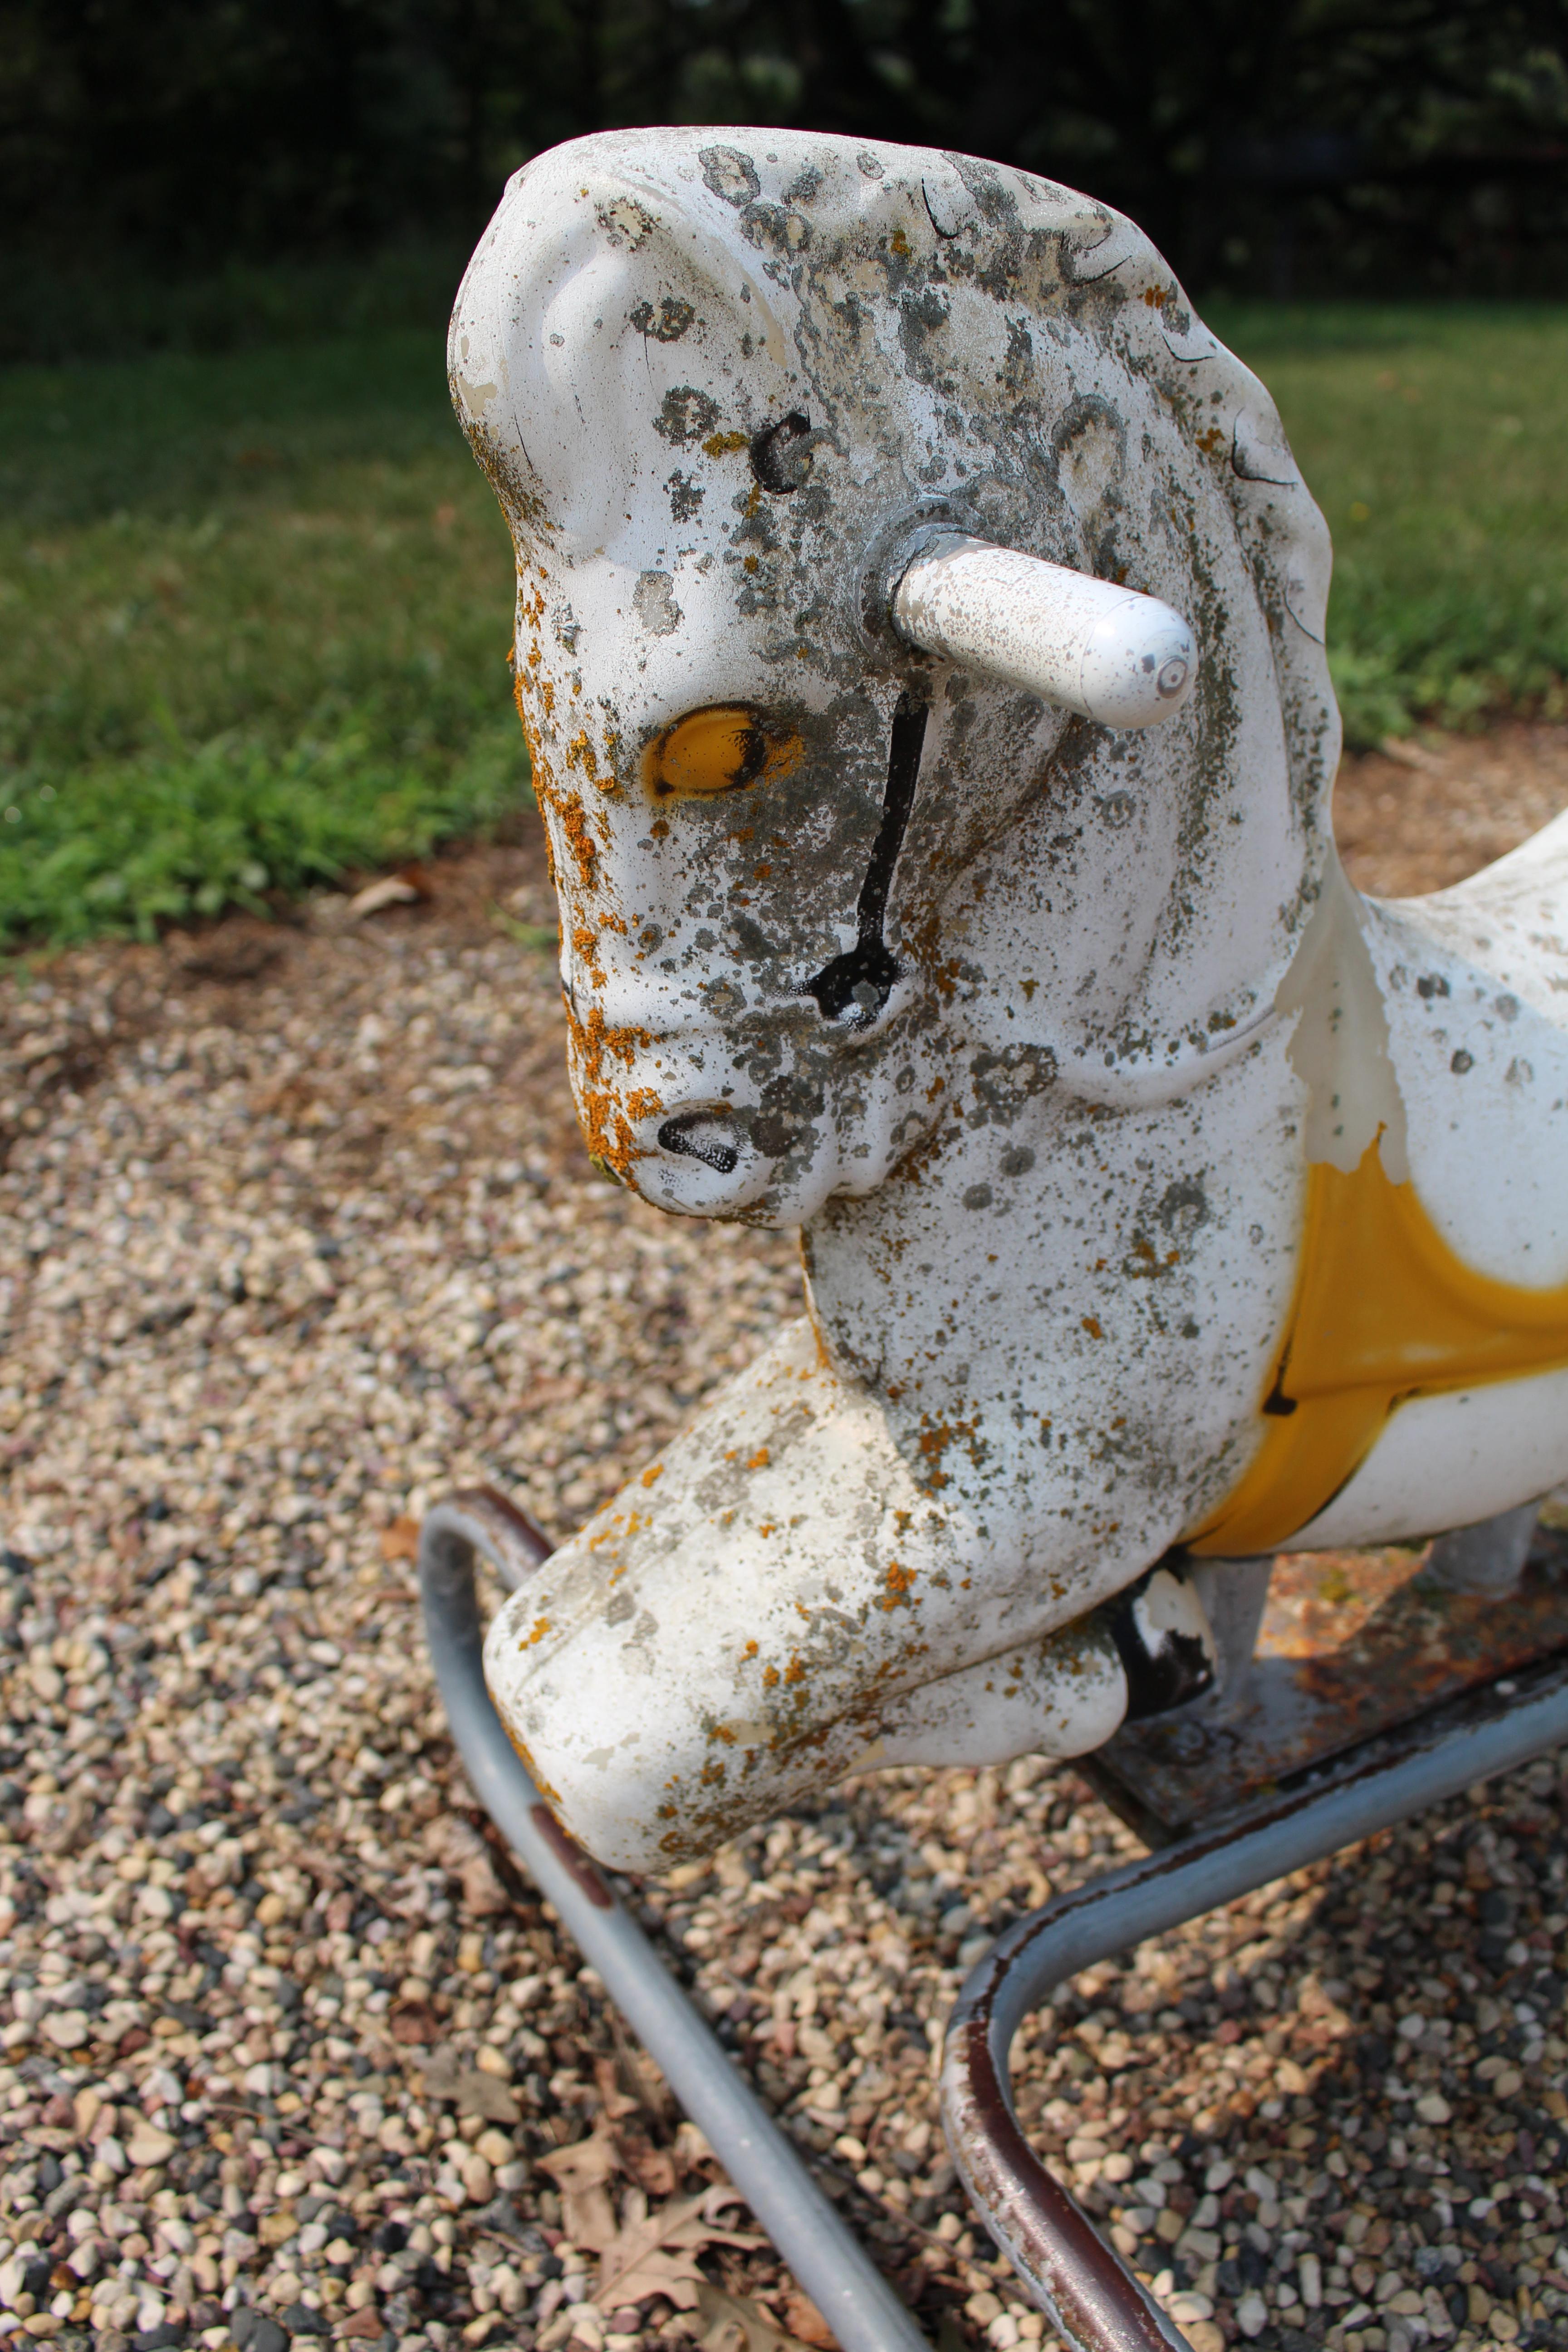 decaying rocking horse riding playground equipment